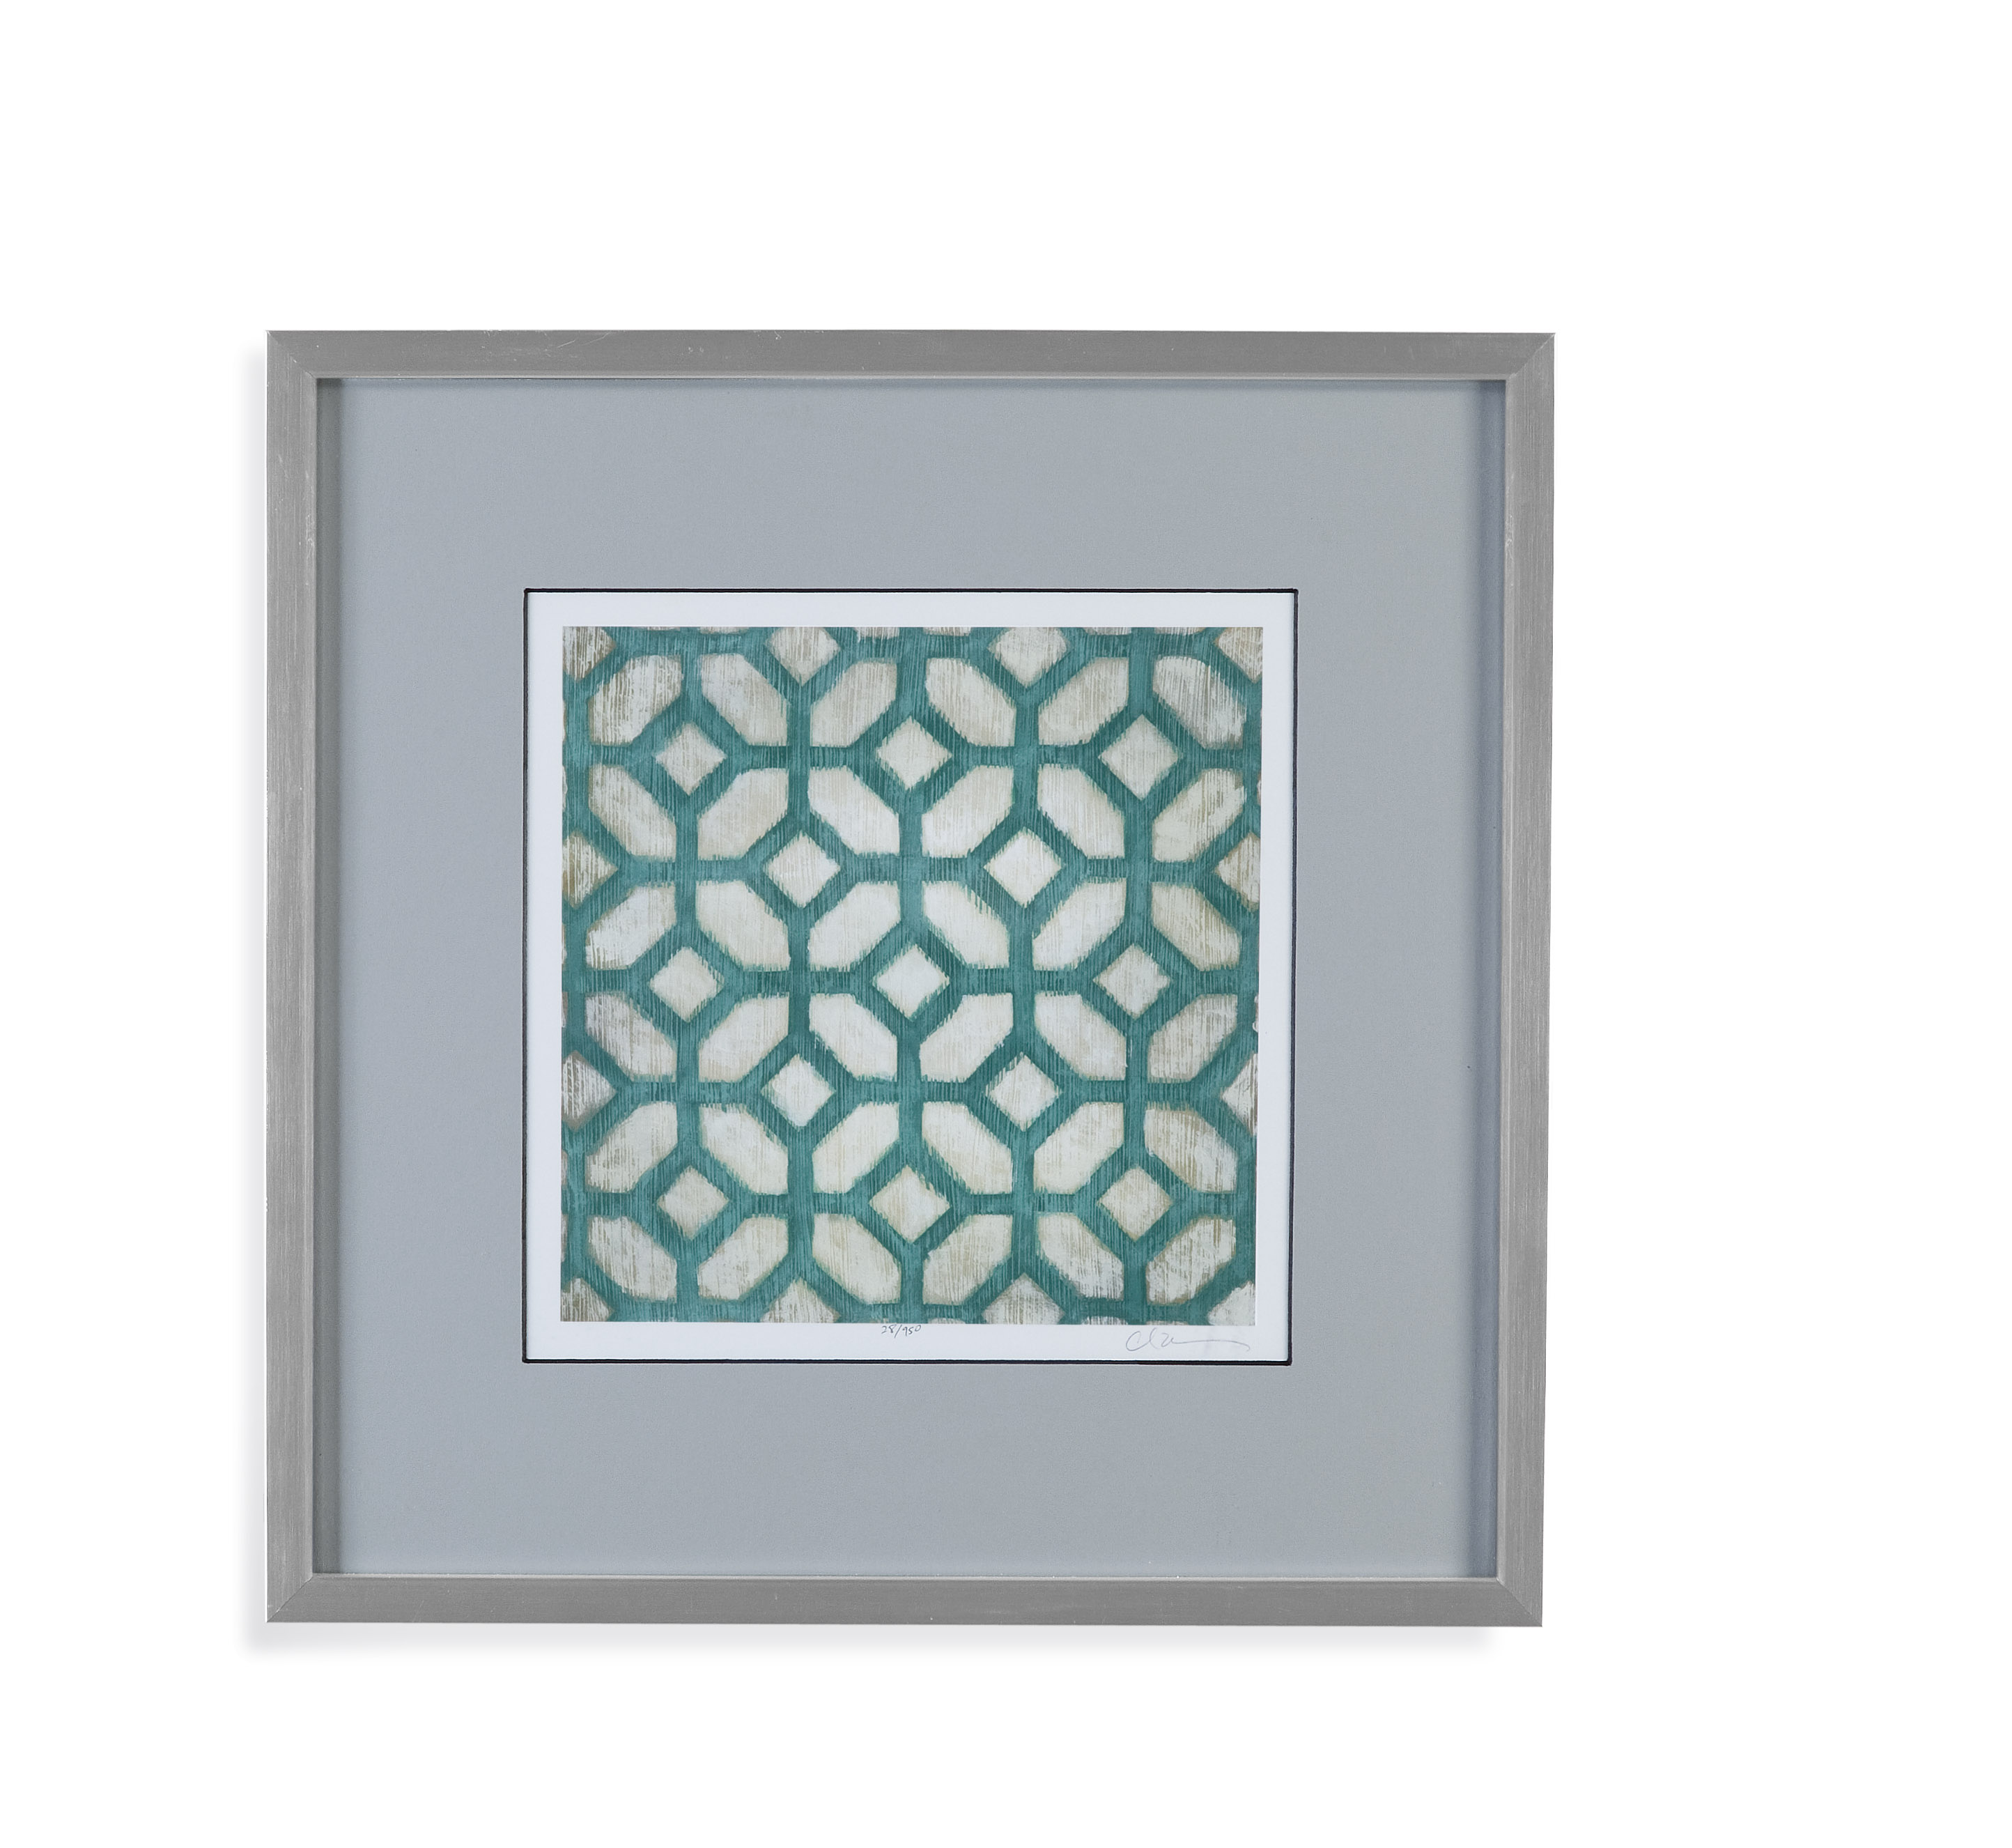 Thoroughly Modern Spectrum Symmetry IX by Bassett Mirror at Esprit Decor Home Furnishings